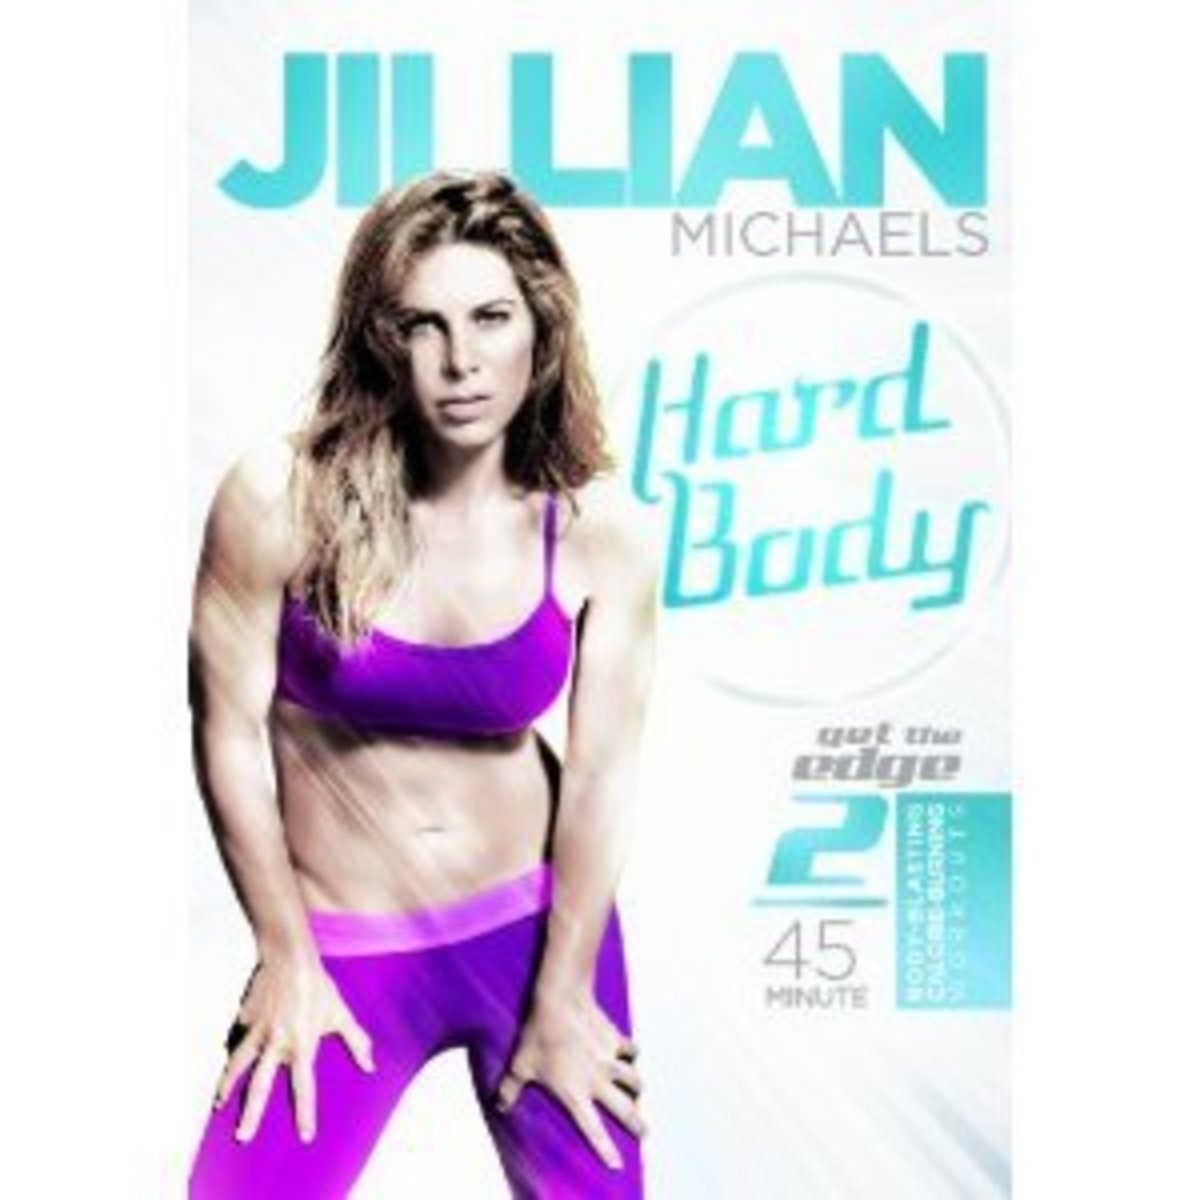 Review of Jillian Michaels' Hard Body DVD